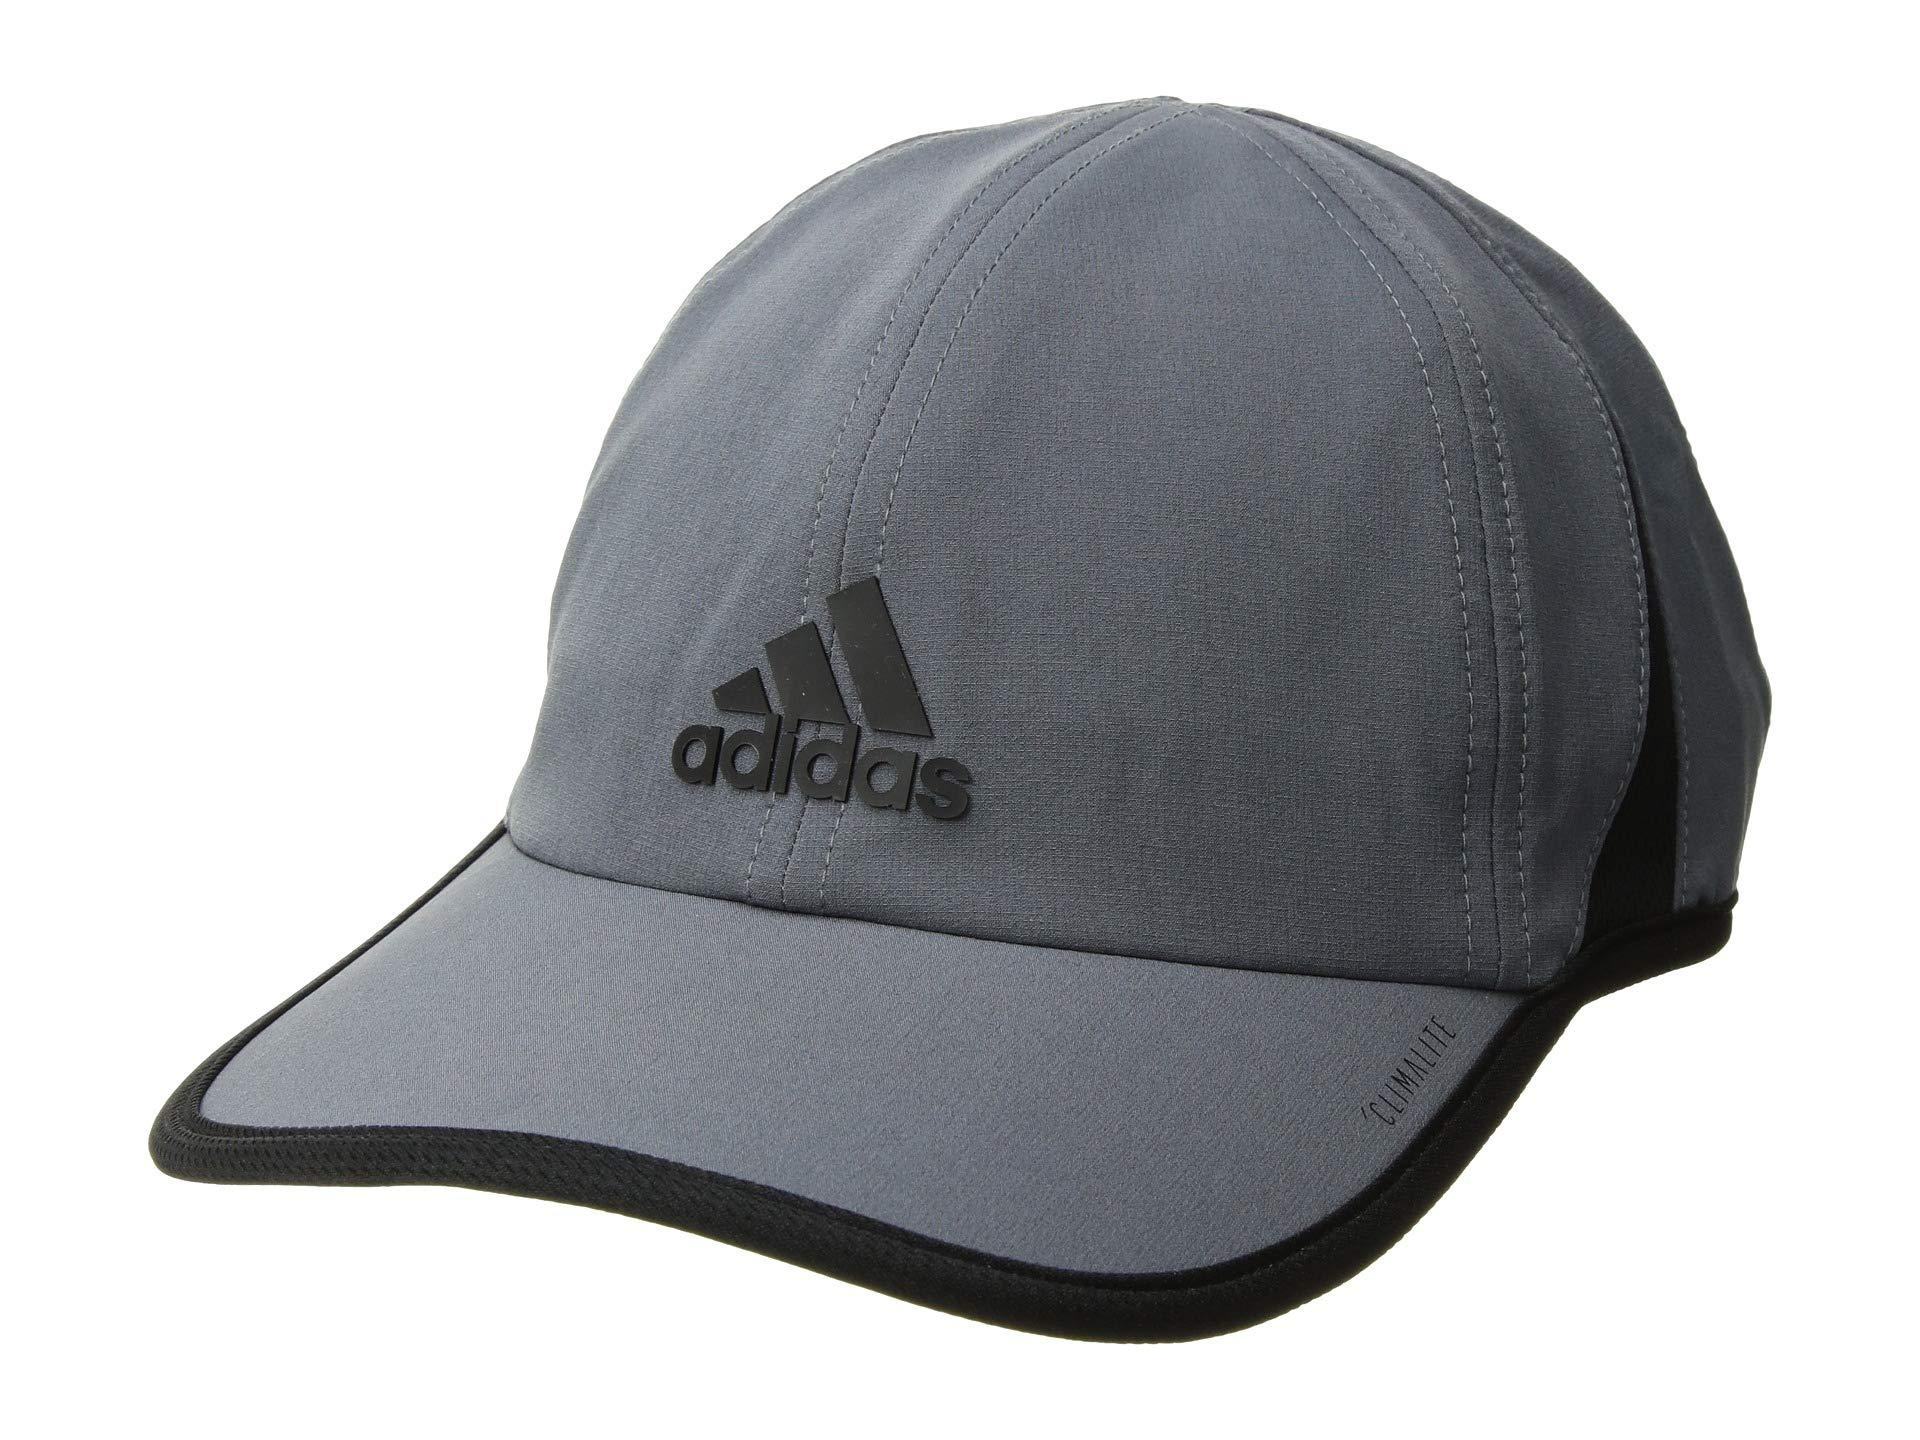 26c6d8d318a4e5 Lyst - adidas Superlite Cap (onix/black) Caps in Black for Men